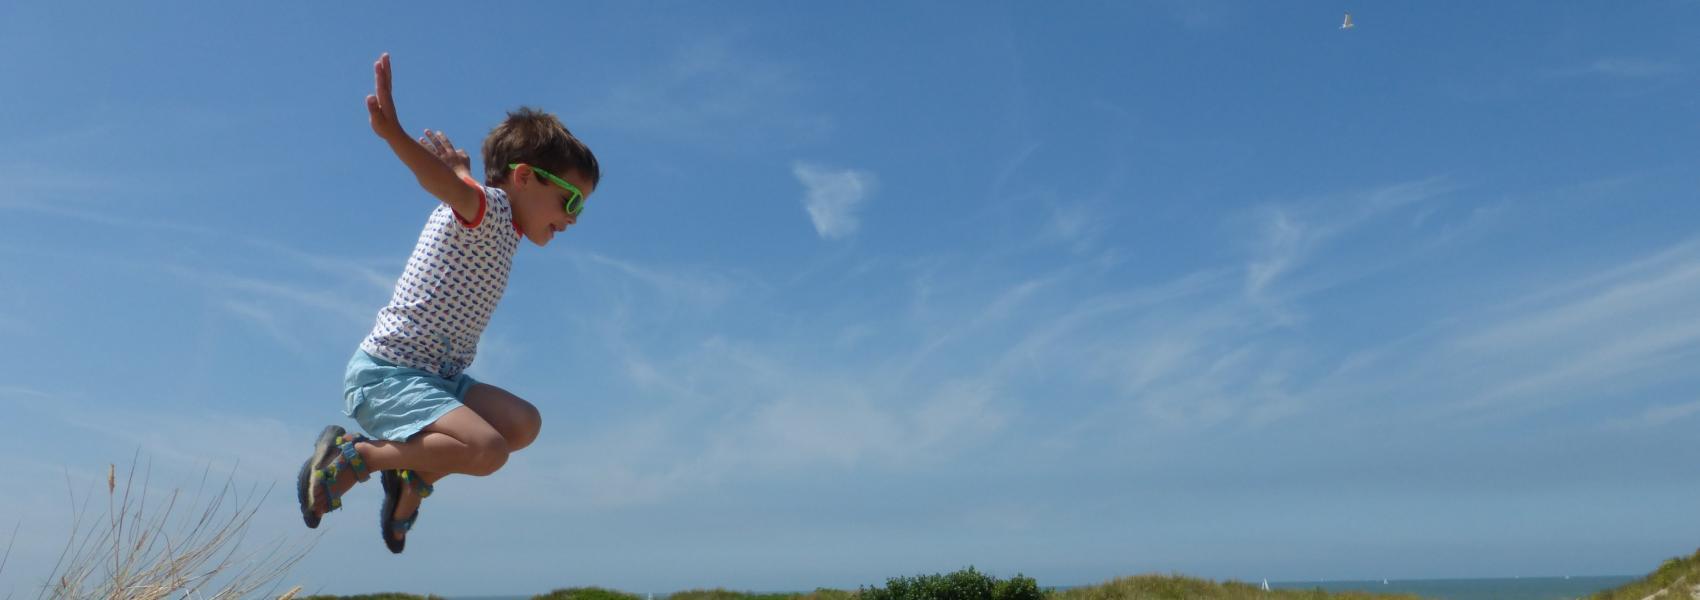 kind springt van zandheuvel